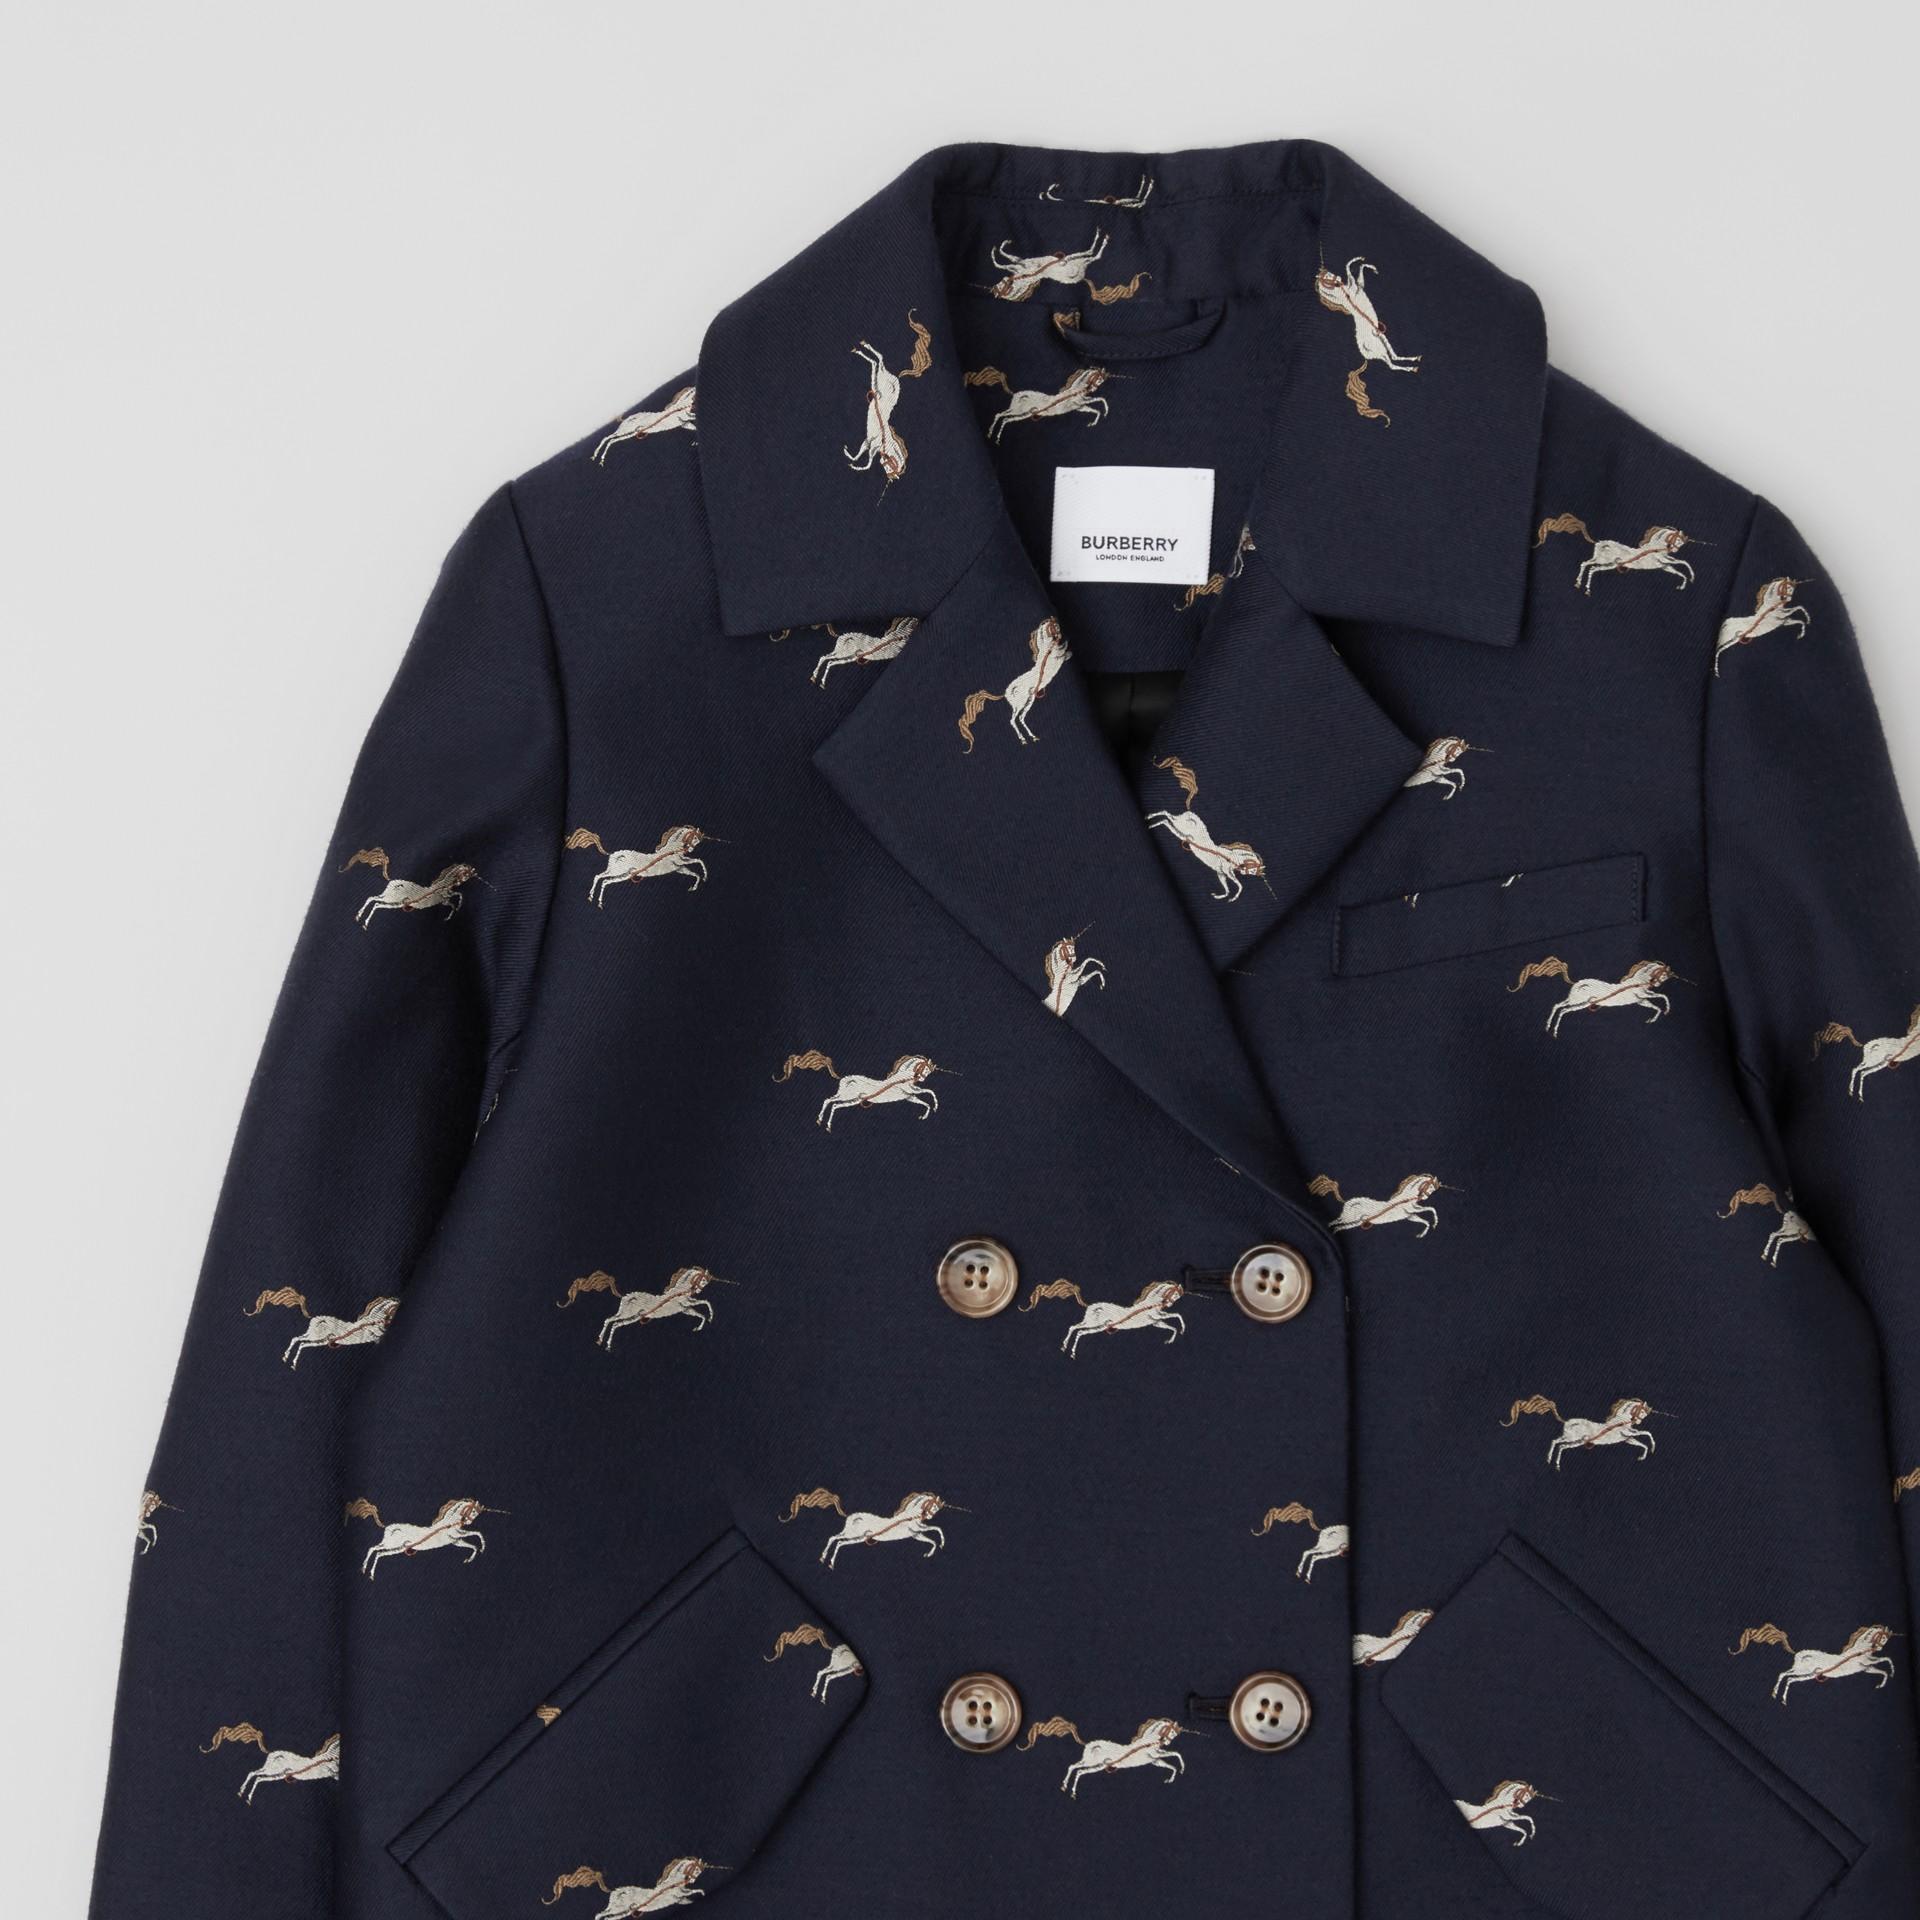 Unicorn Wool Silk Jacquard Tailored Coat in Navy   Burberry United Kingdom - gallery image 4